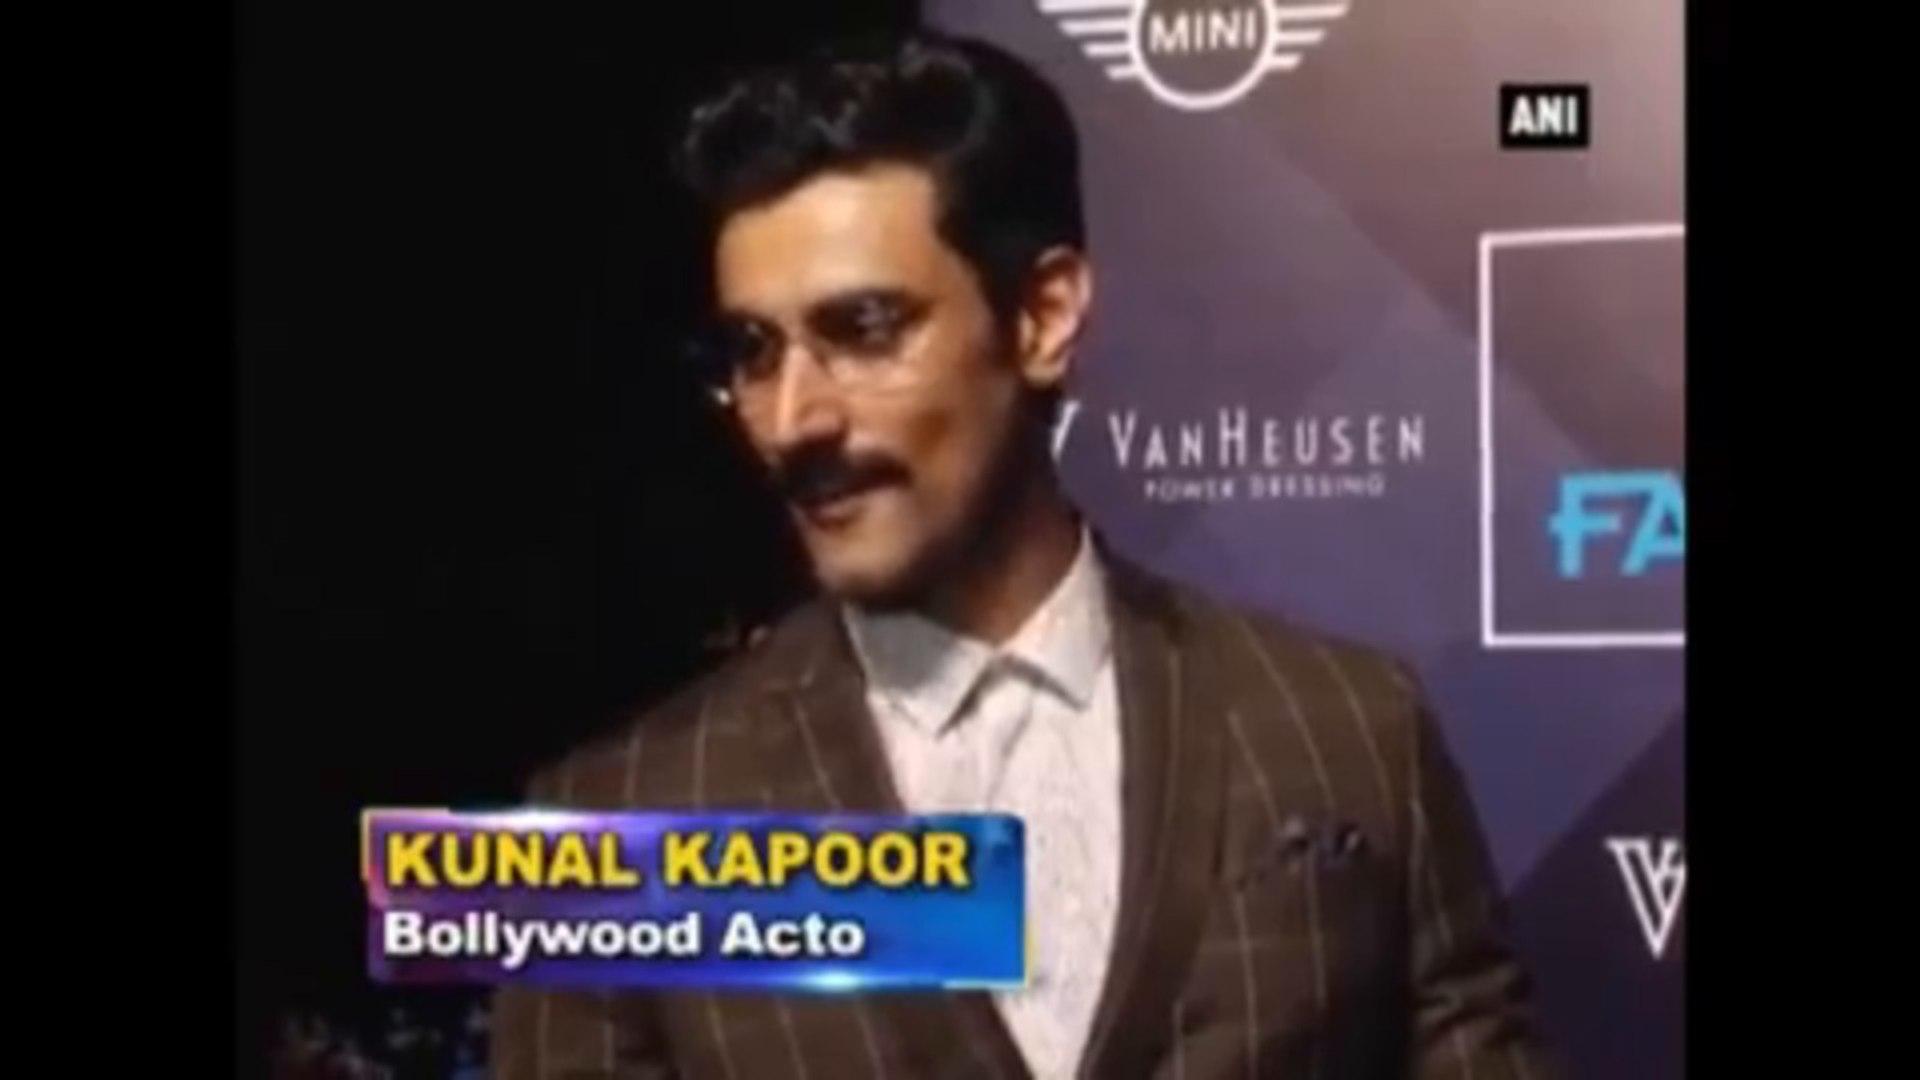 For Kunal Kapoor, Sanjay Dutt Epitomises Style In India